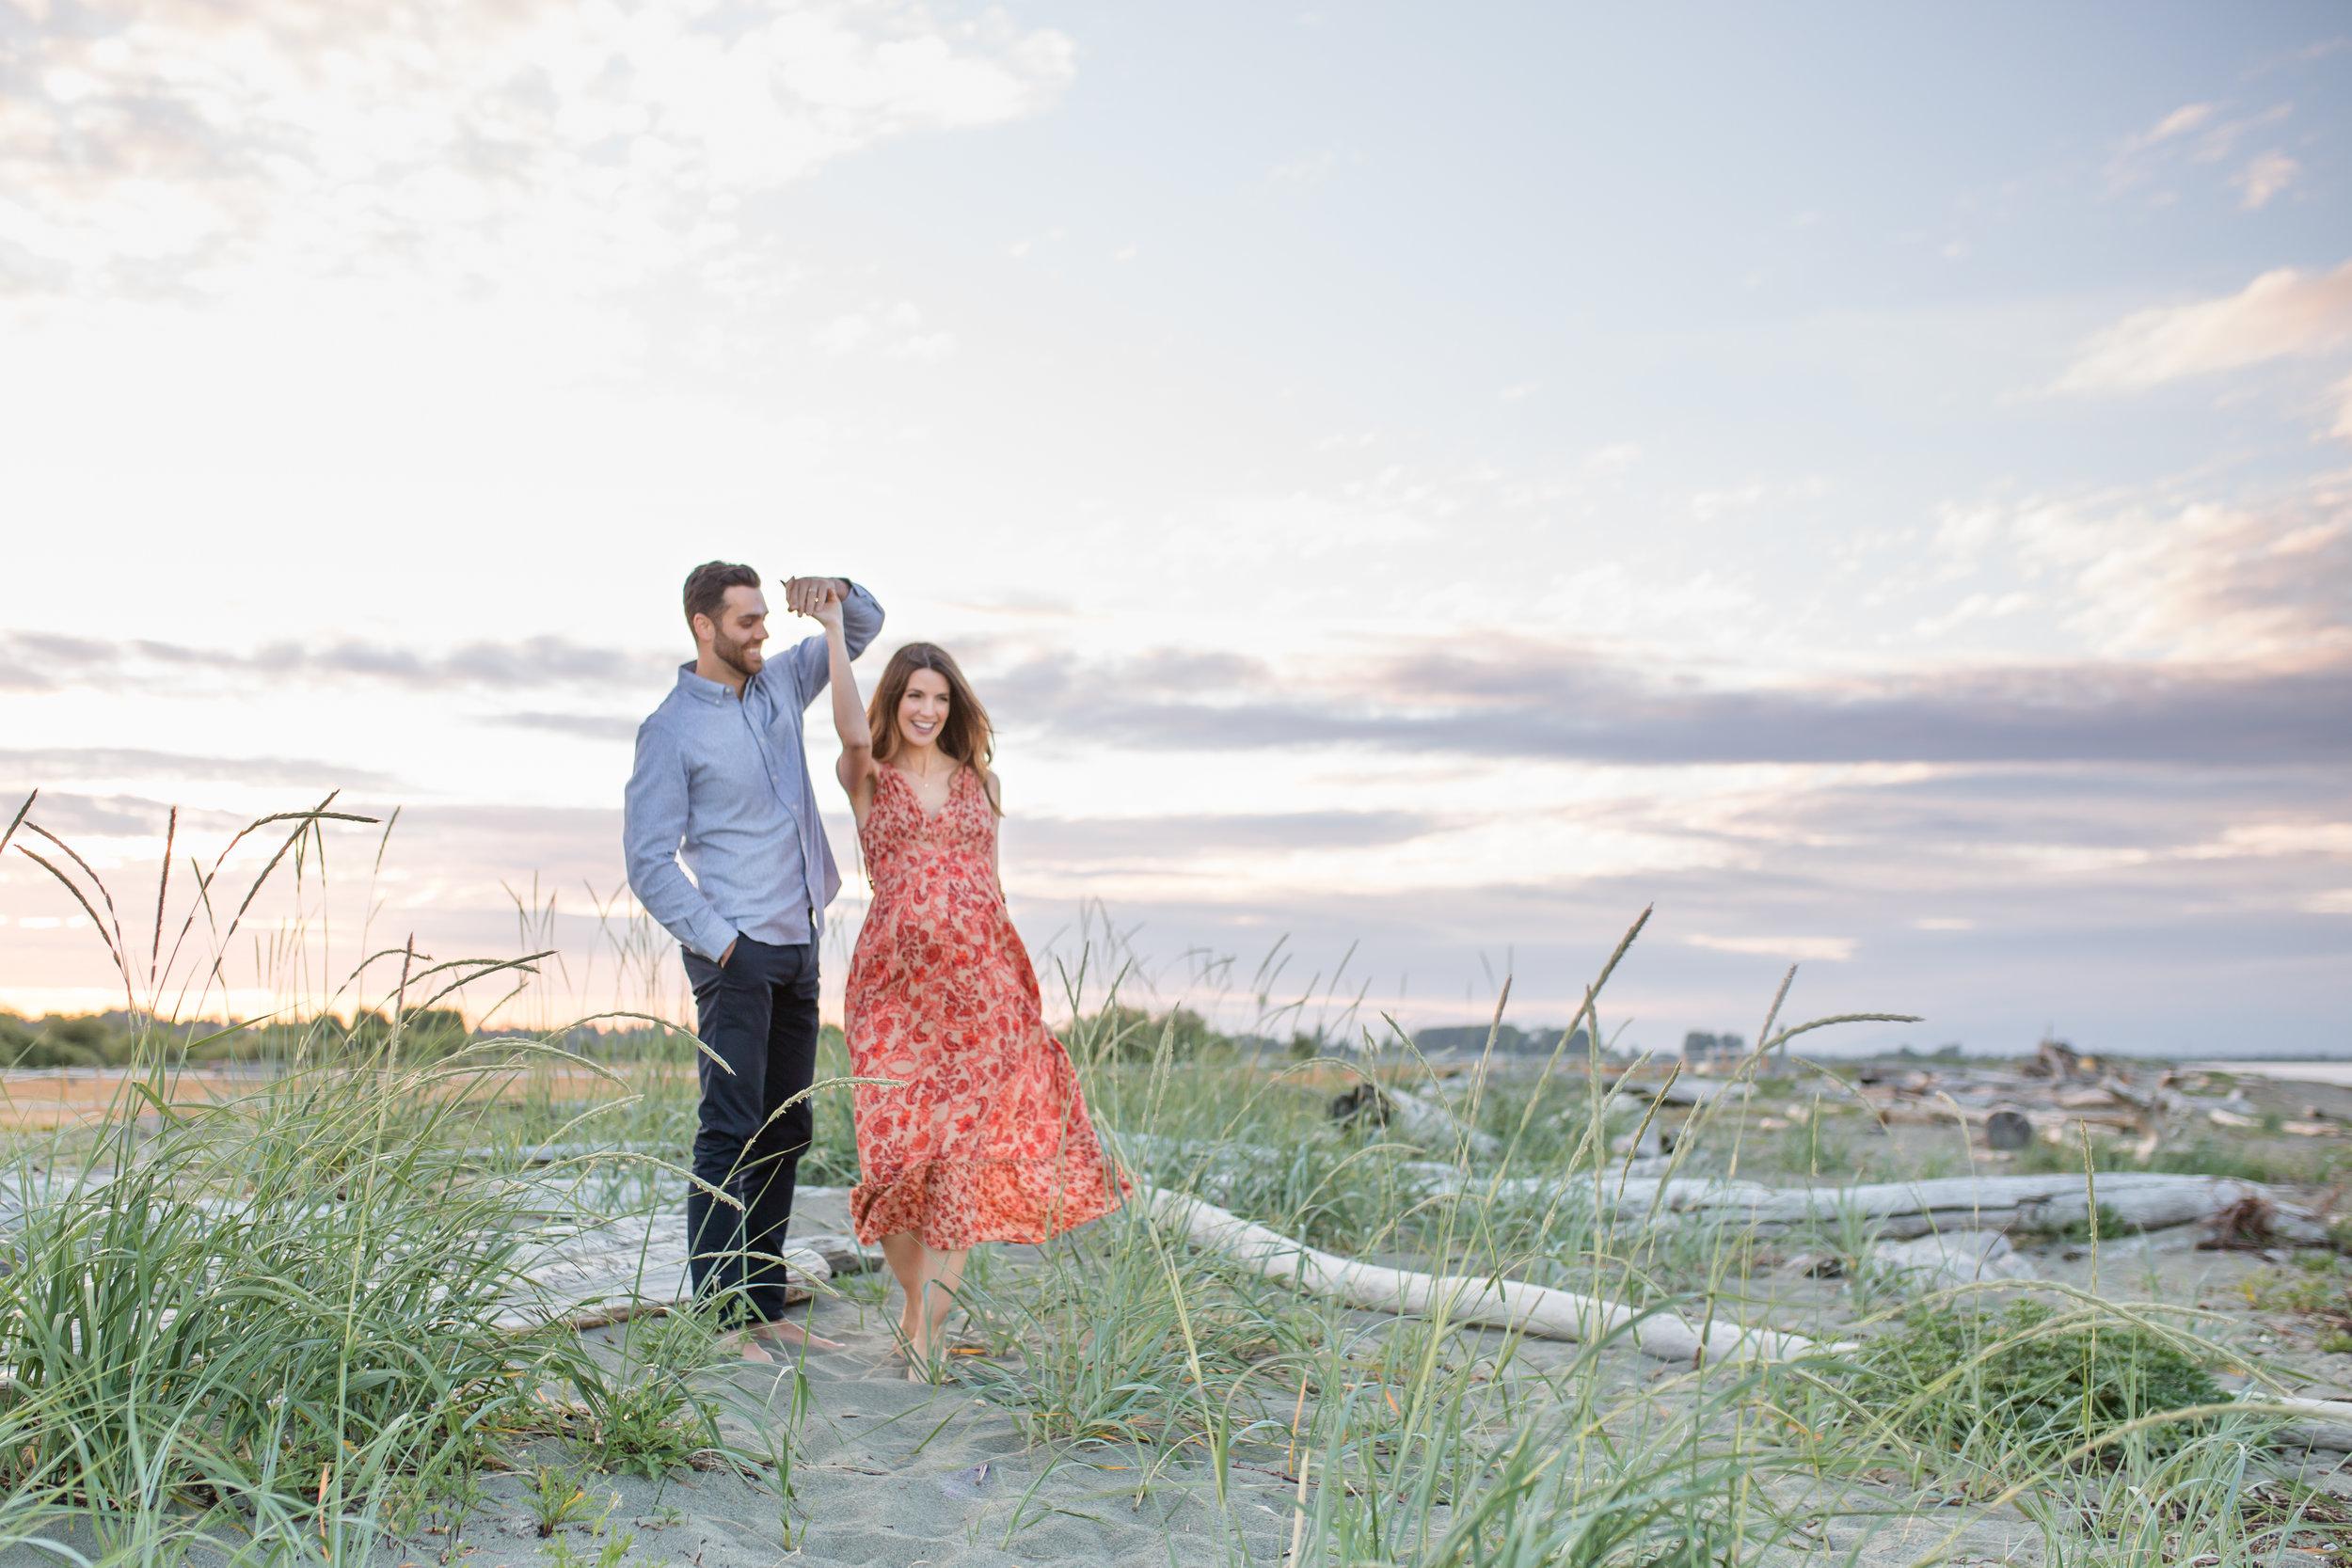 Centennial Beach Maternity Photos -16.jpg